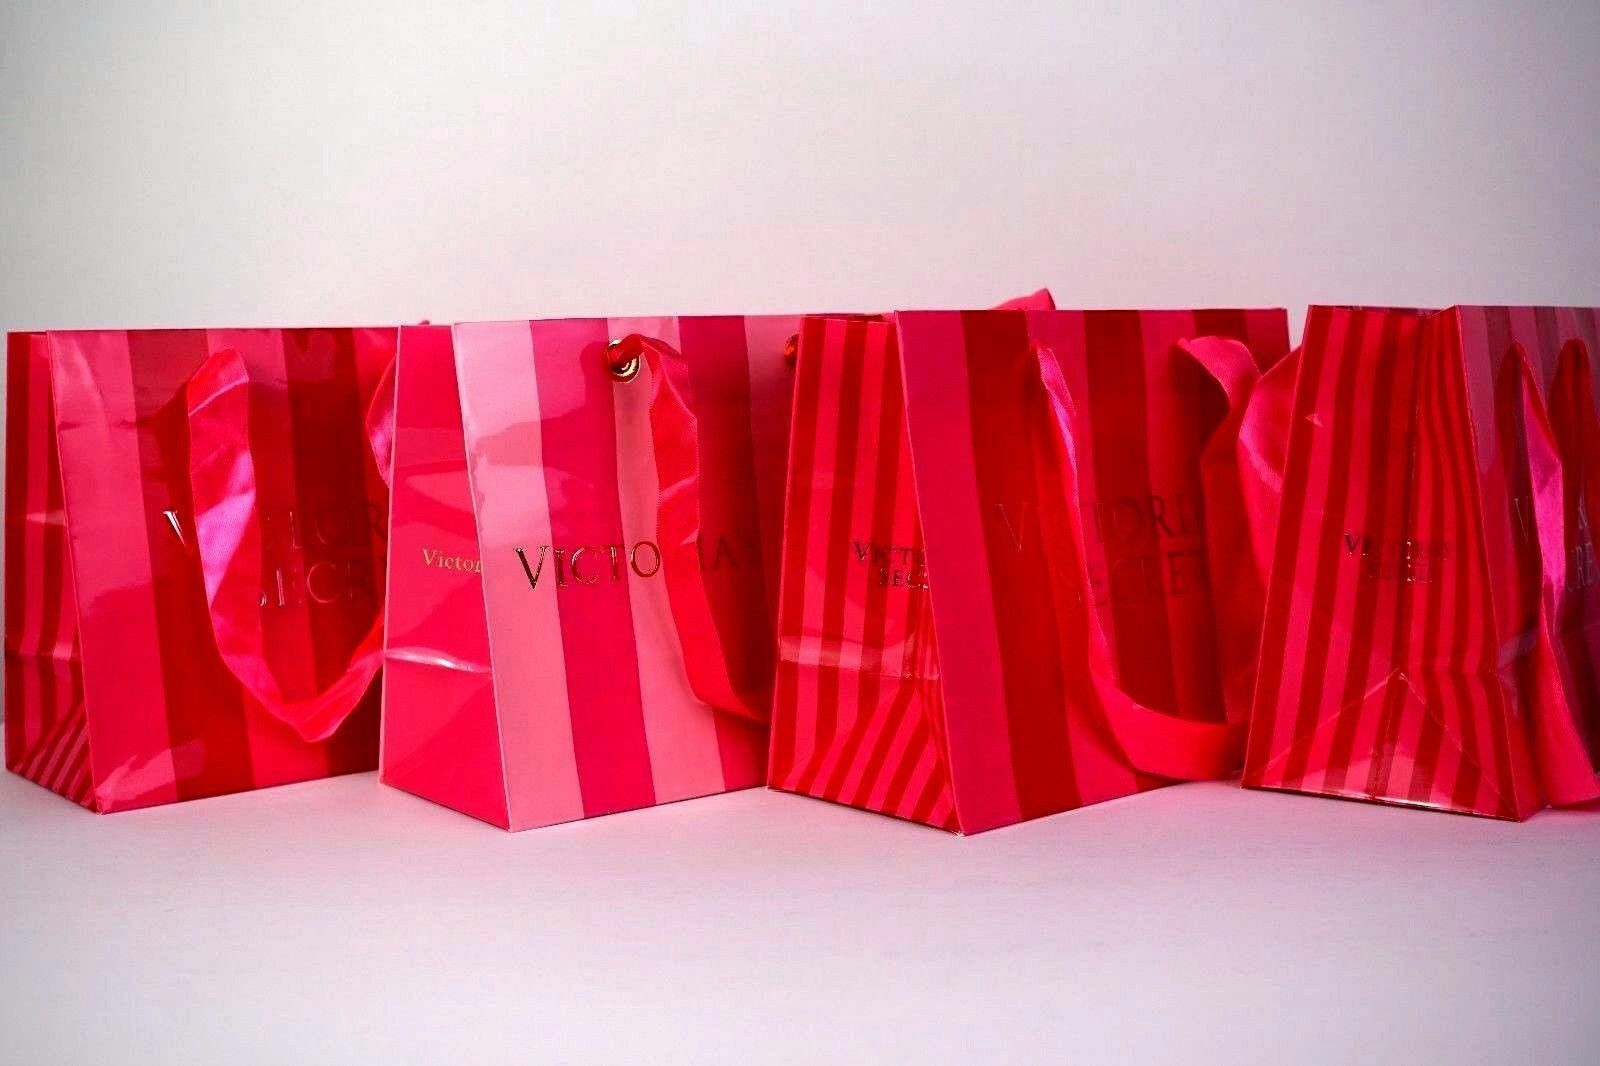 LOT 85 VICTORIA'S SECRET Rosa Rosa Rosa STRIPE PAPER MEDIUM SHOPPING GIFT BAG 7725f9